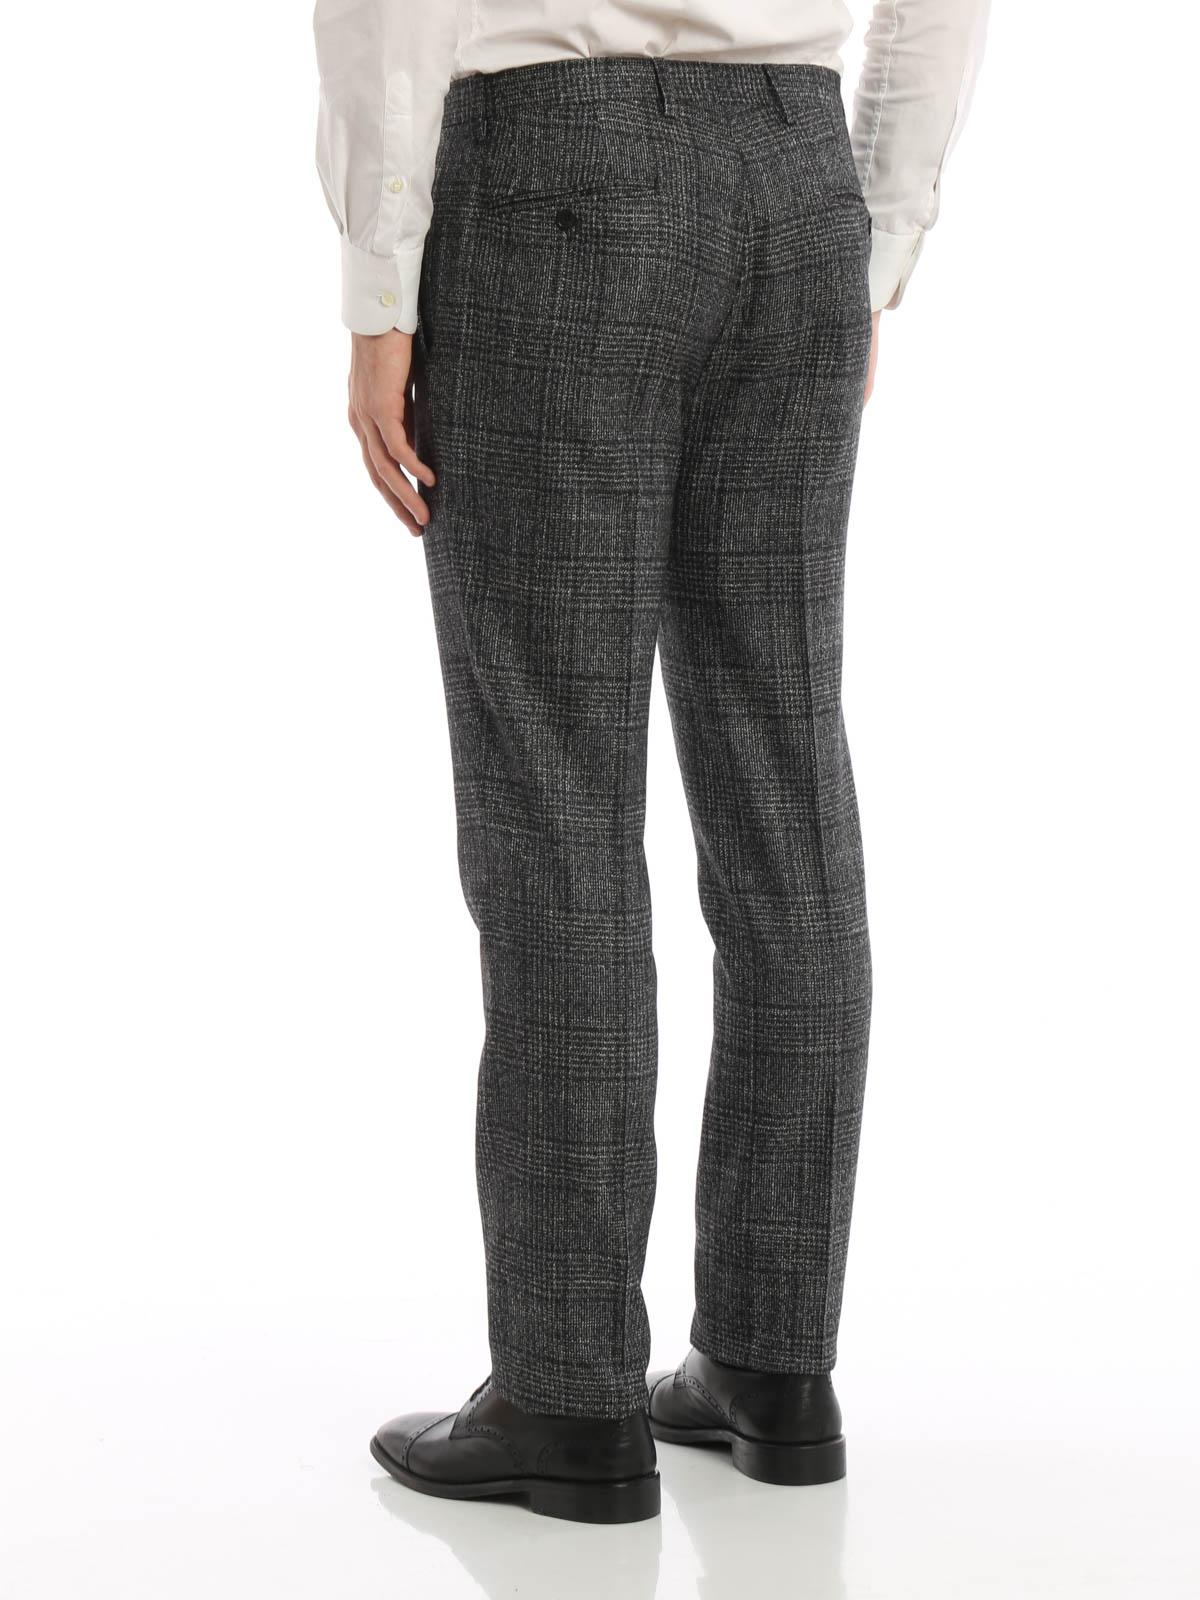 Salvatore Ferragamo Pantalon De Vestir Gris Para Hombre Pantalones De Sastreria 65259214s722